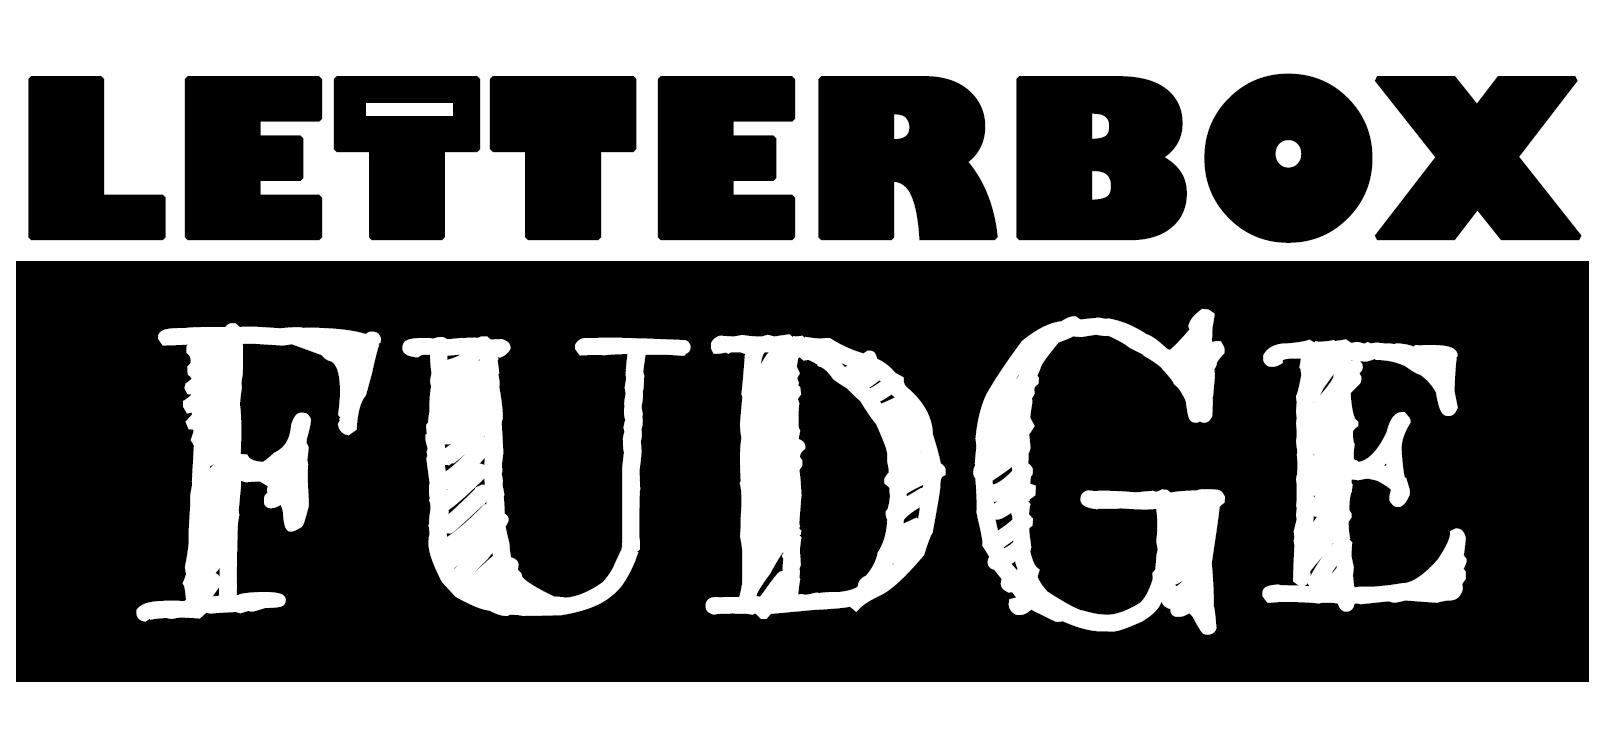 Letterbox Fudge